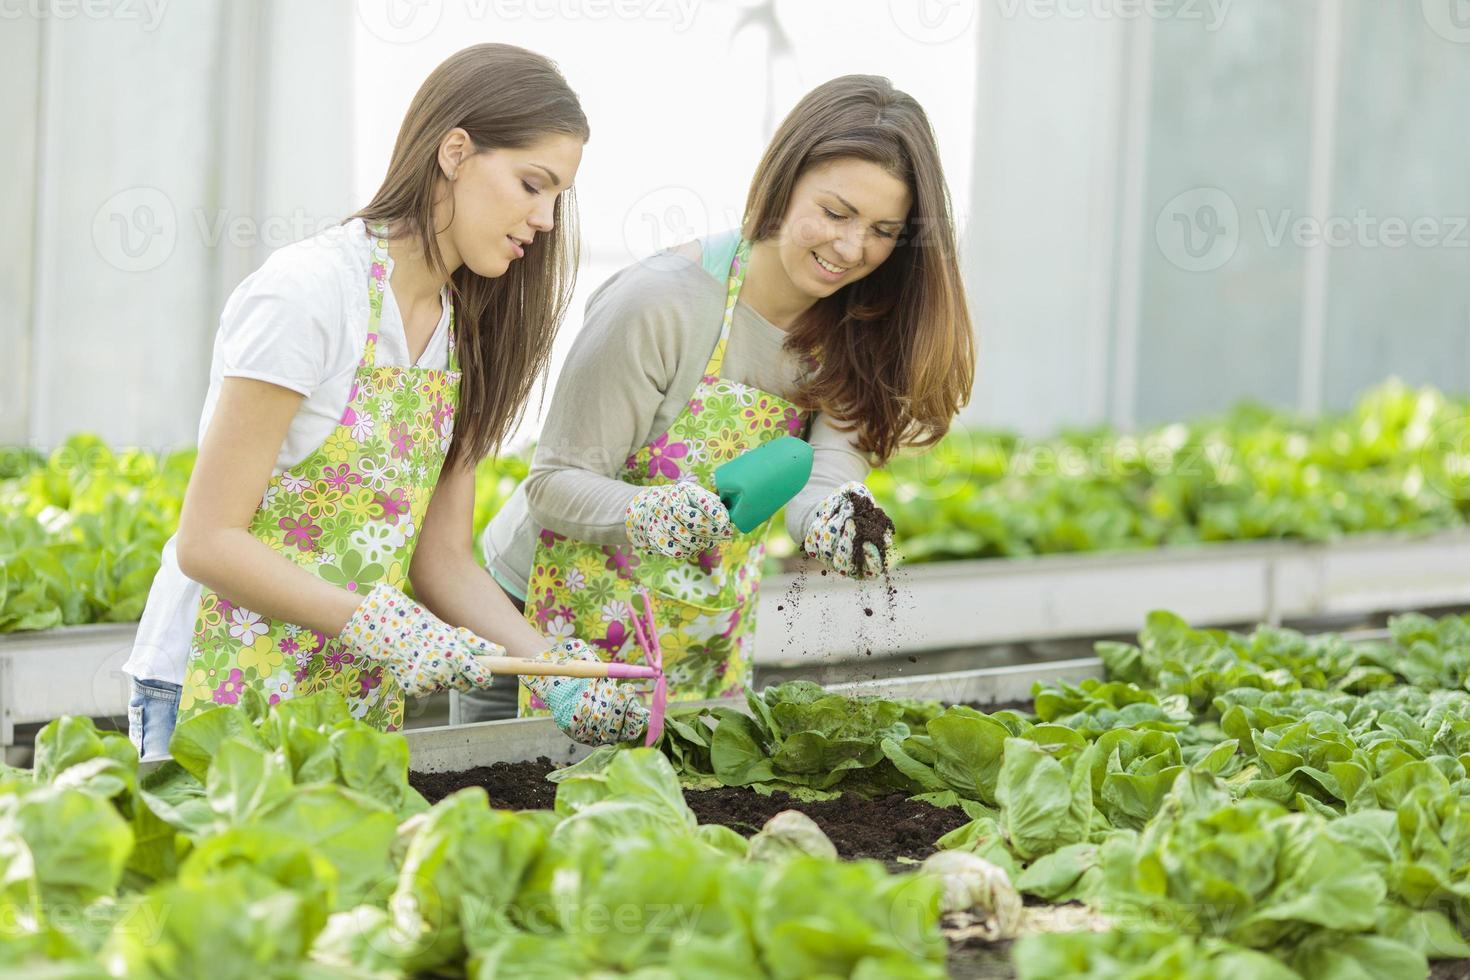 Young women in the garden photo